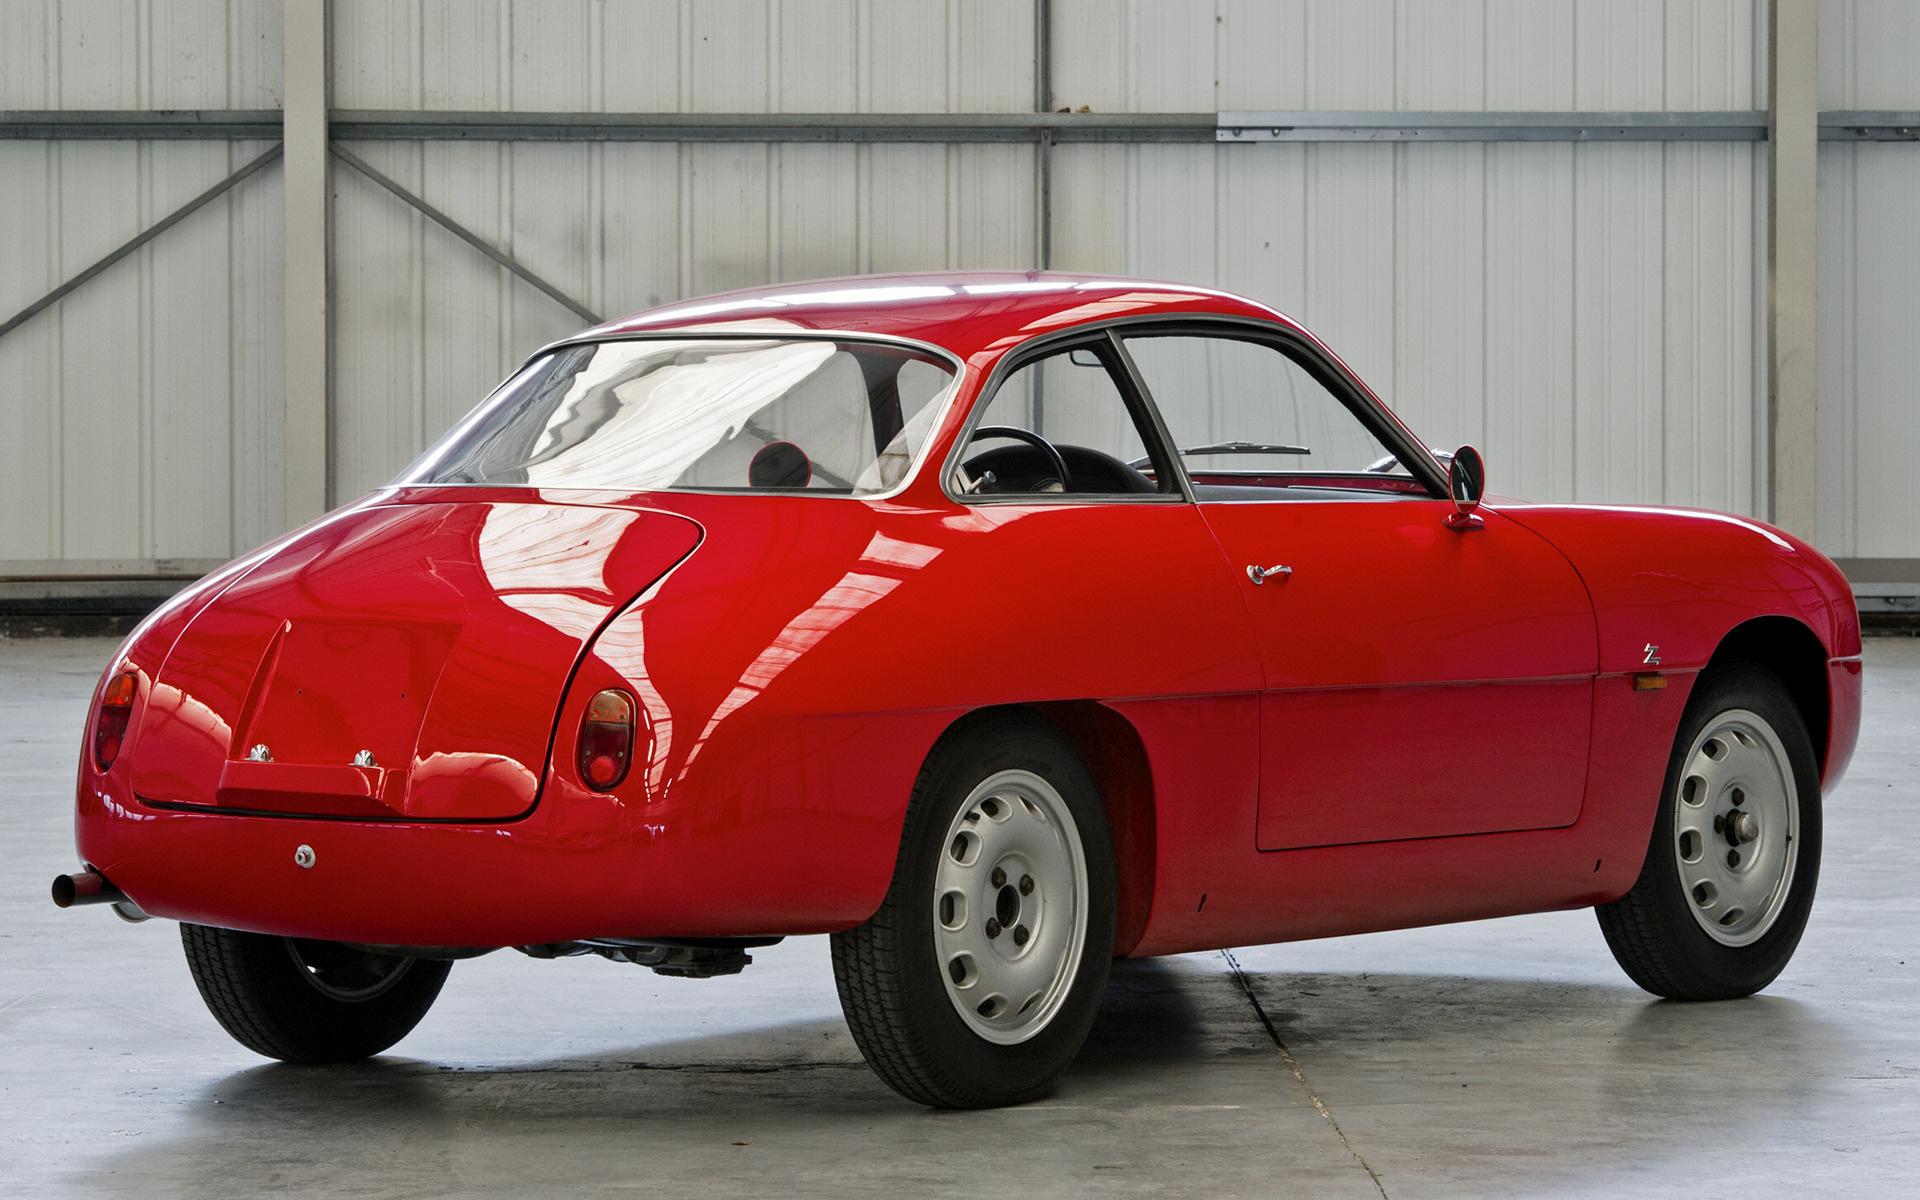 Alfa Romeo Giulietta Sz 1960 Wallpapers And Hd Images